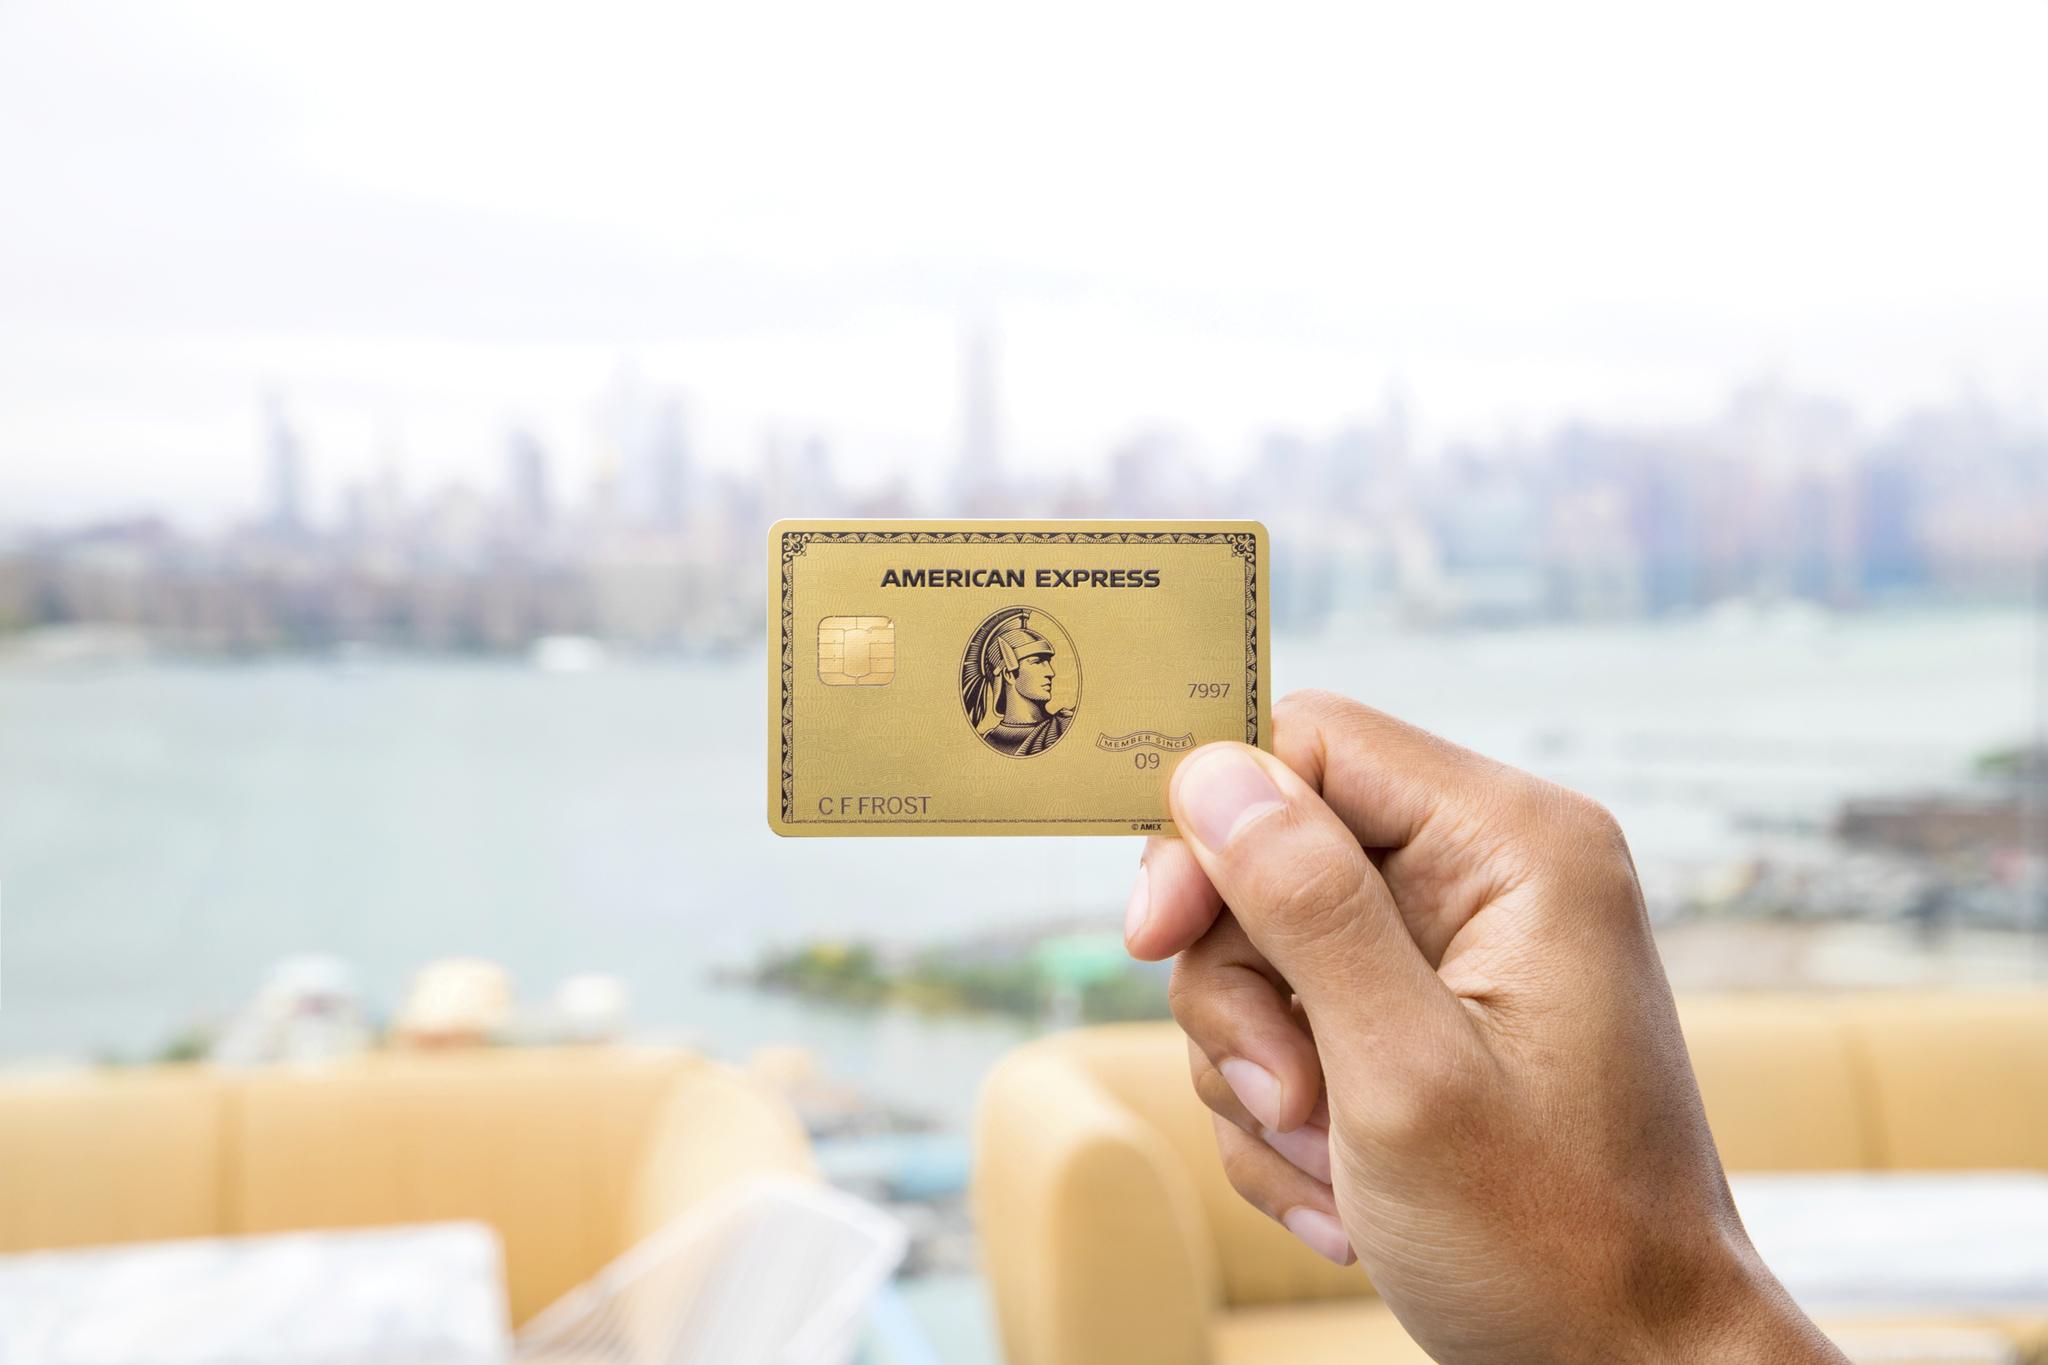 Amex Gold Card 60K referral offer